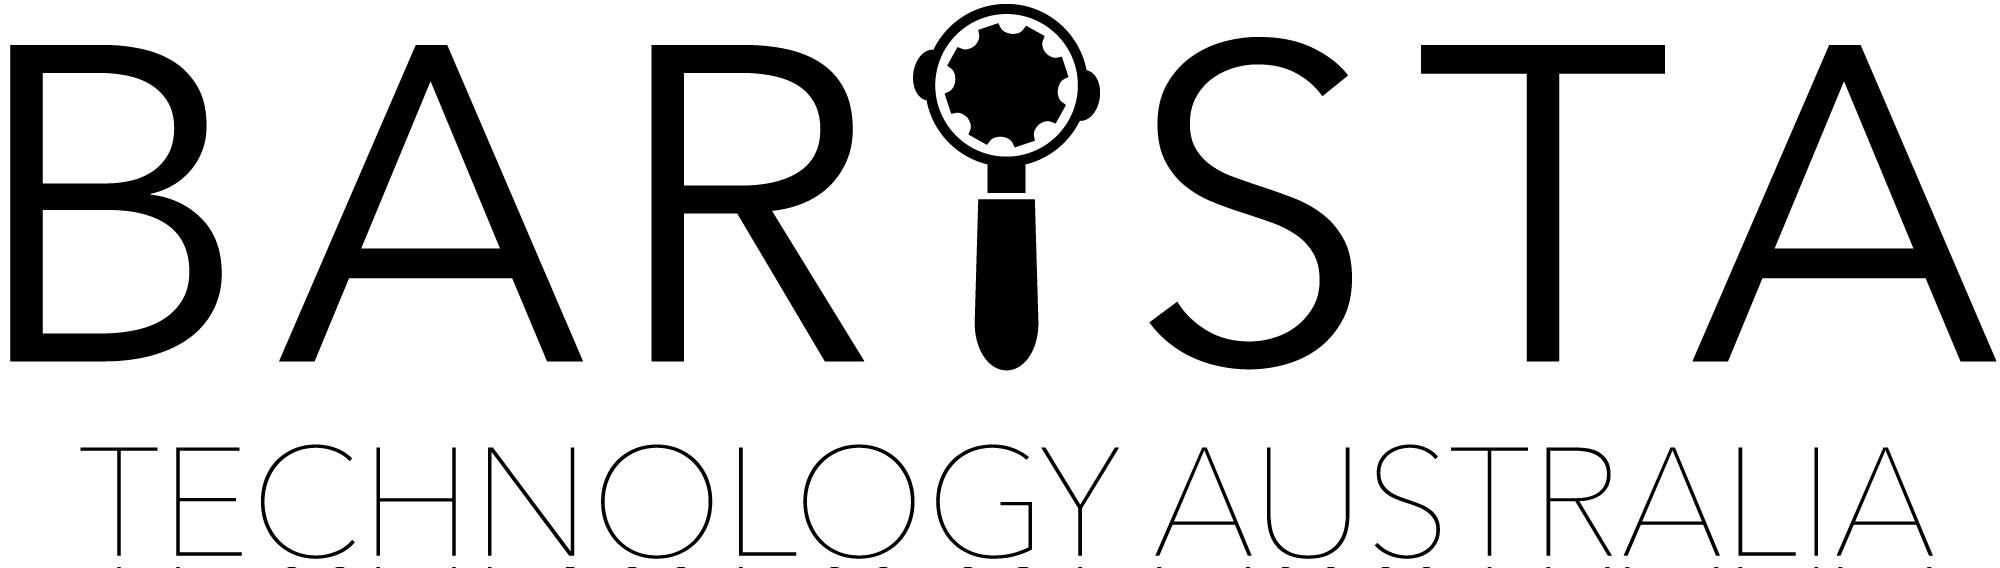 Barista-Technology-Logo-Black-Large.jpg